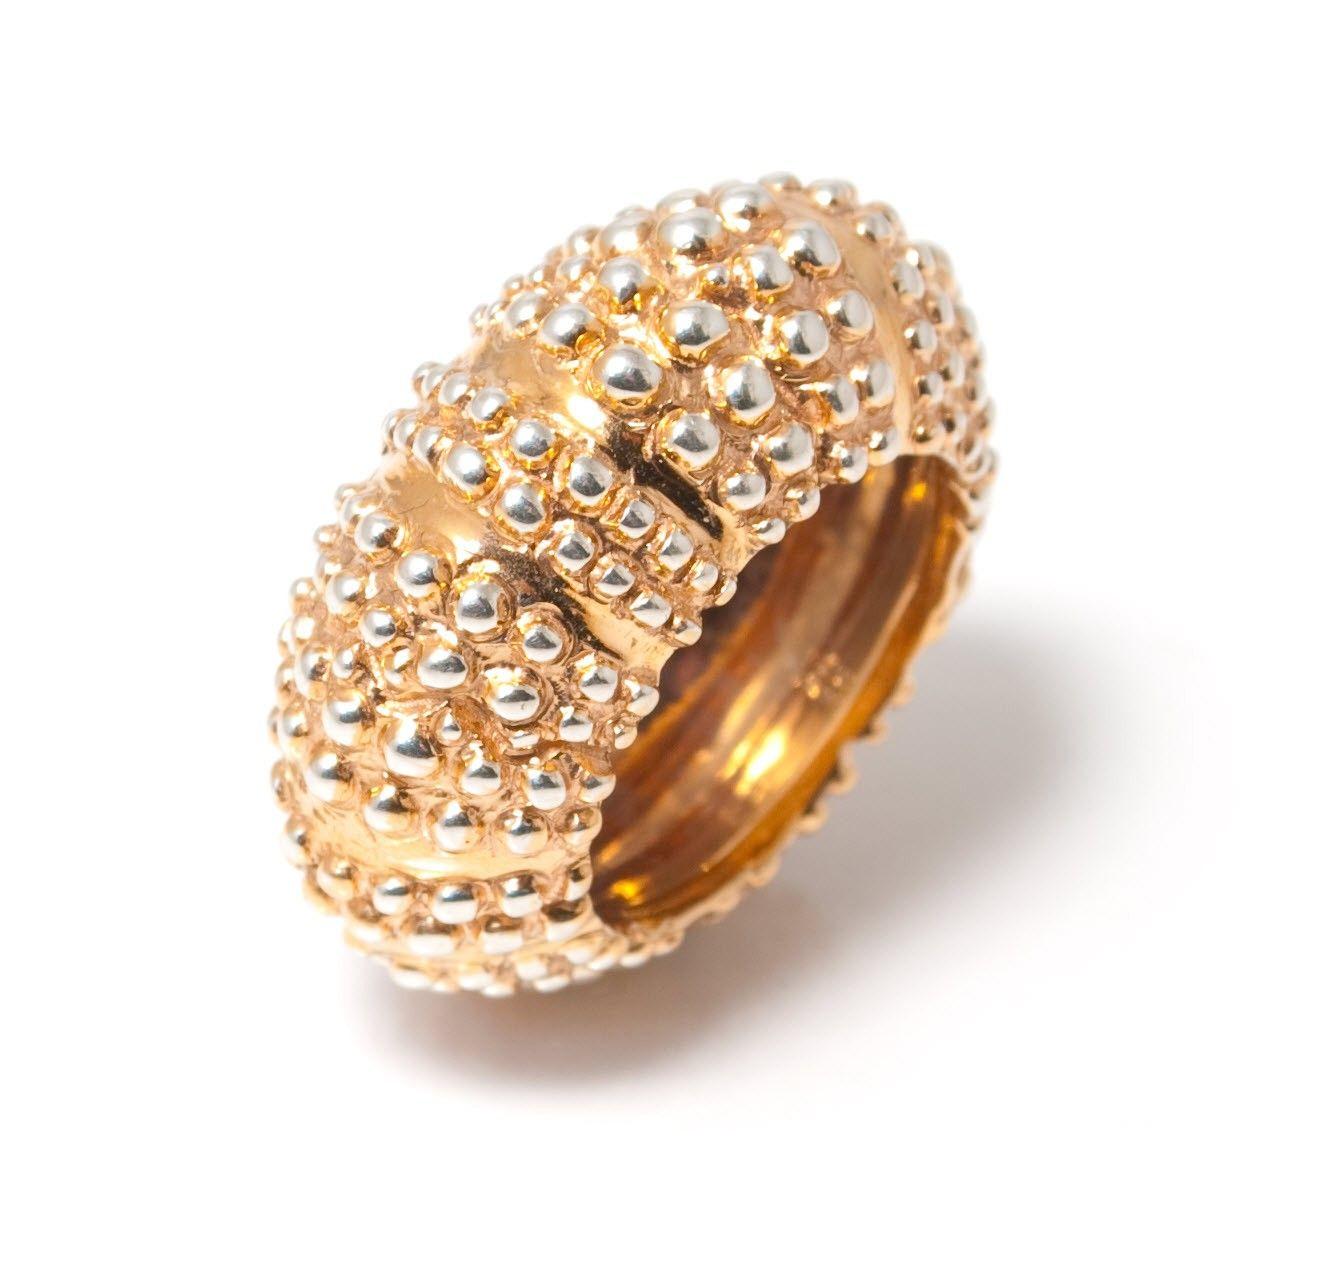 "Flavie Michou - ""Oursin"" #ring"